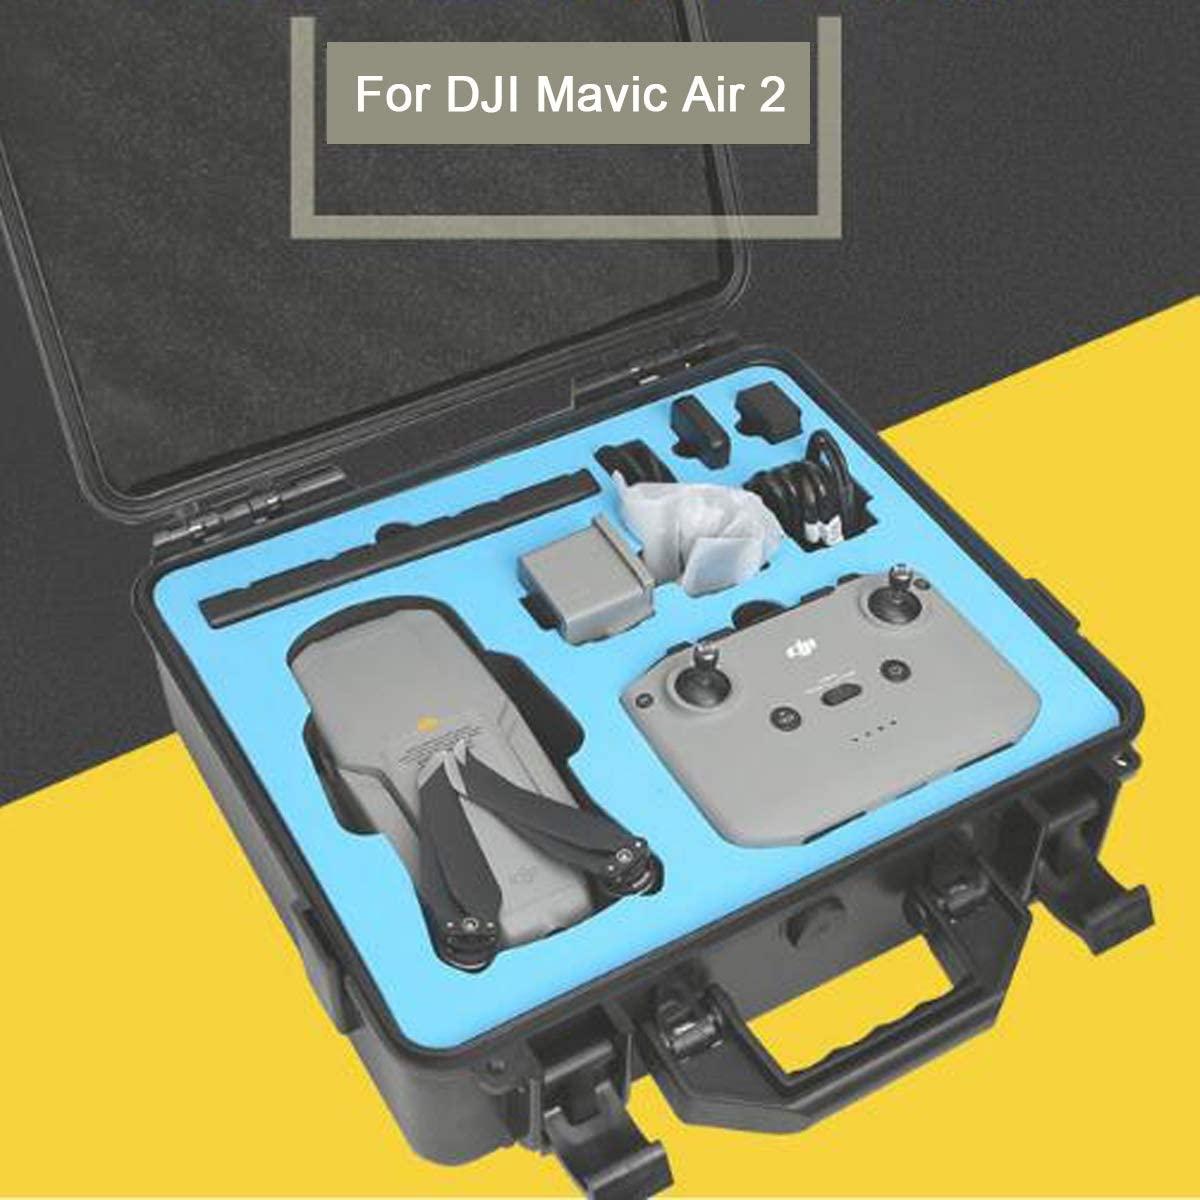 SUNCHI Handheld Travel Box ABS Carrying Bag Hard Storage Case for DJI Mavic Air 2 RC Quadcopter